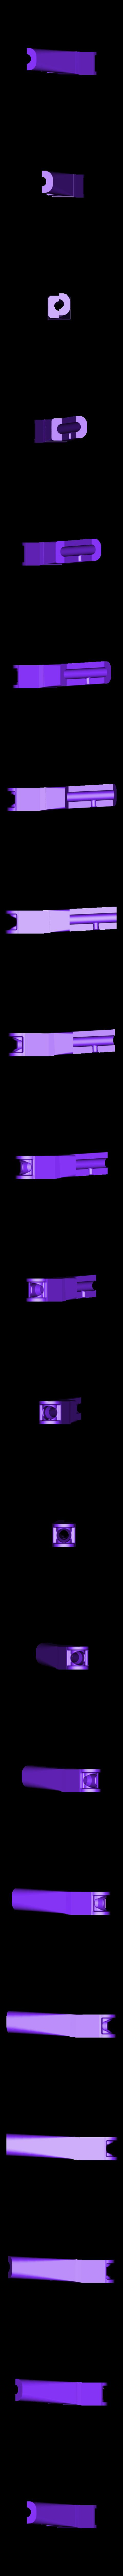 arm rear6 (1pcs).STL Download STL file Folding Quadcopter 450 Frame • 3D print object, AleksandrDolzhenko